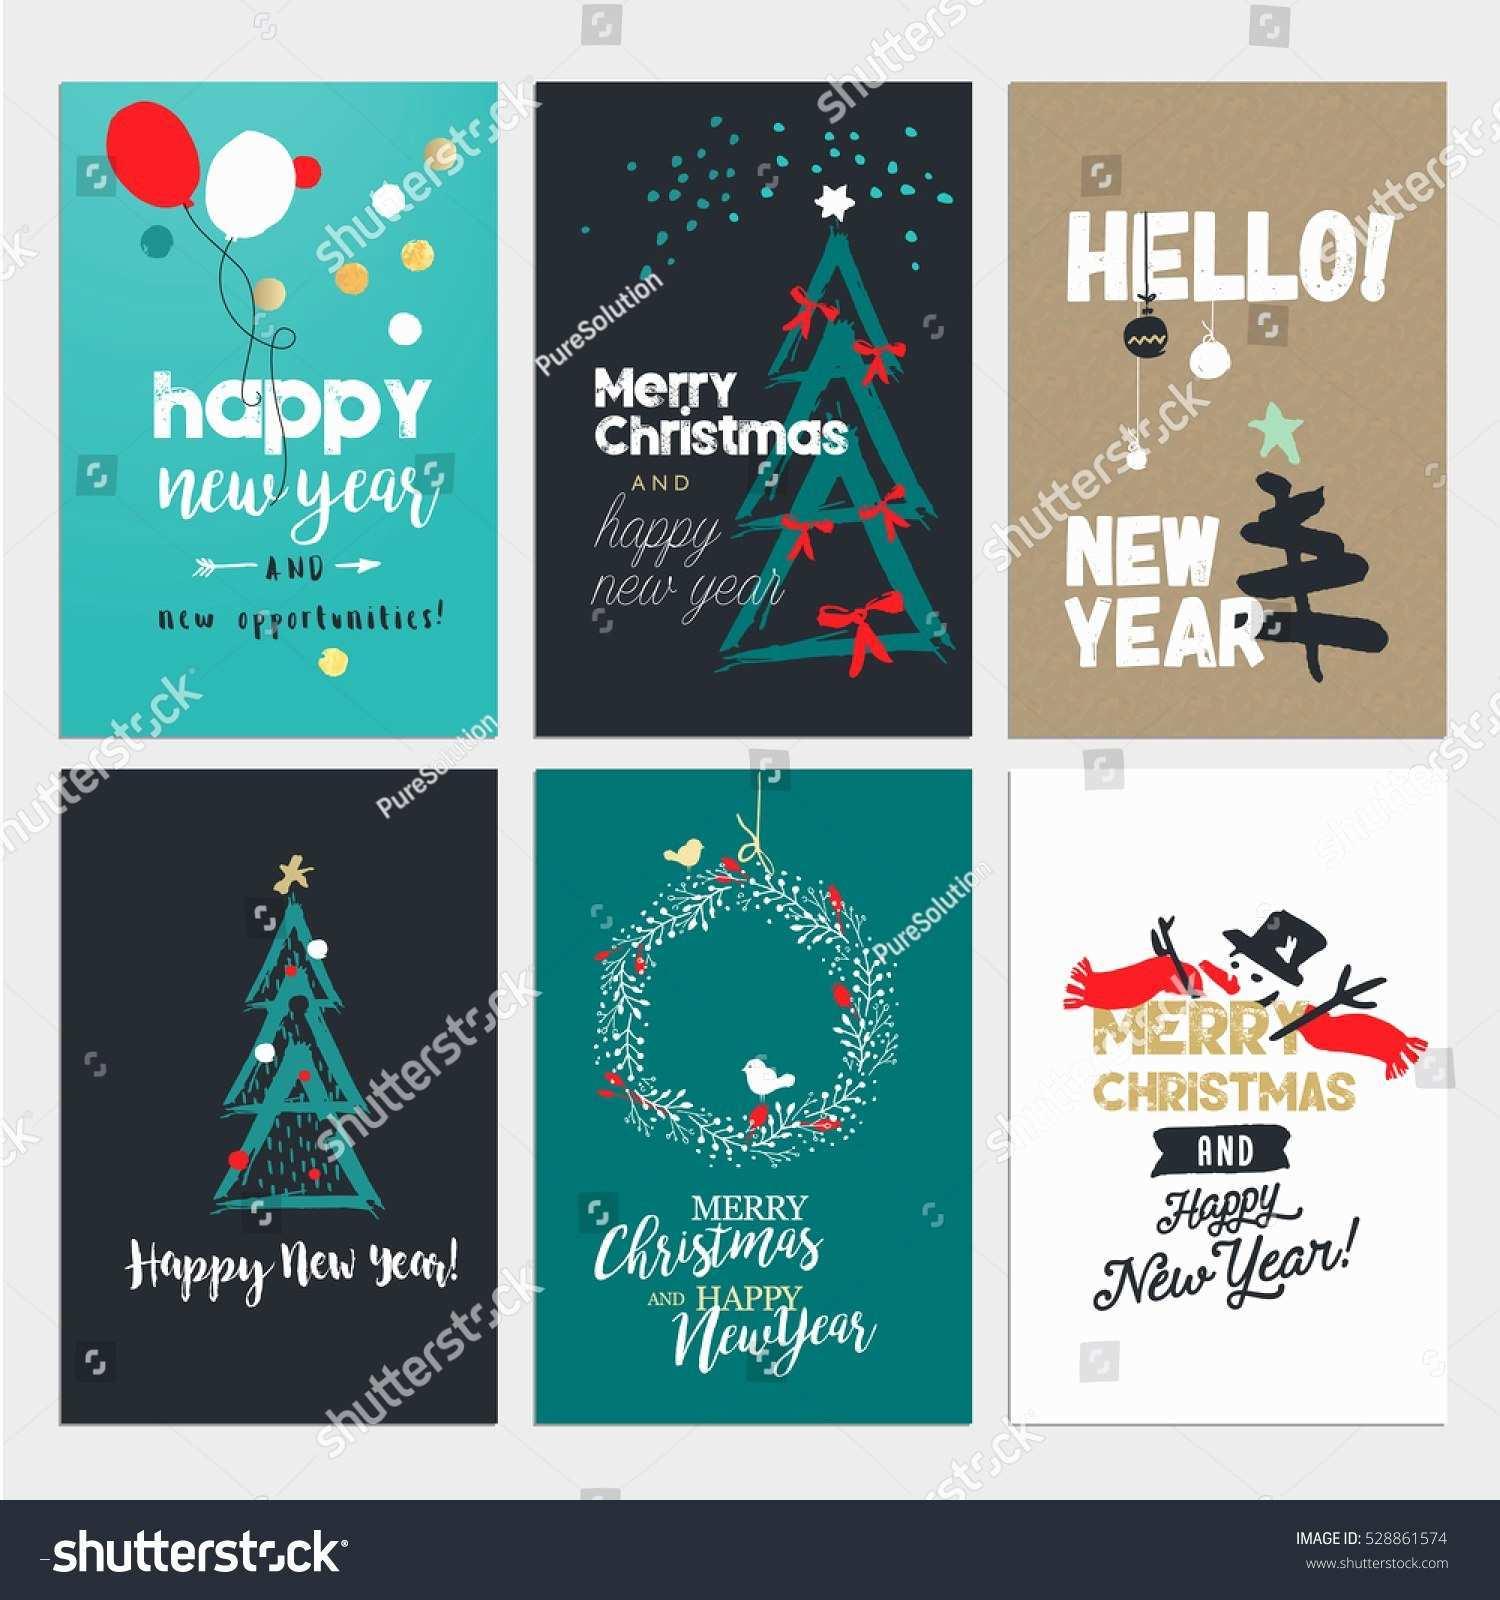 43 Inspirational Free Printable Hallmark Birthday Cards Images - Free Printable Hallmark Birthday Cards